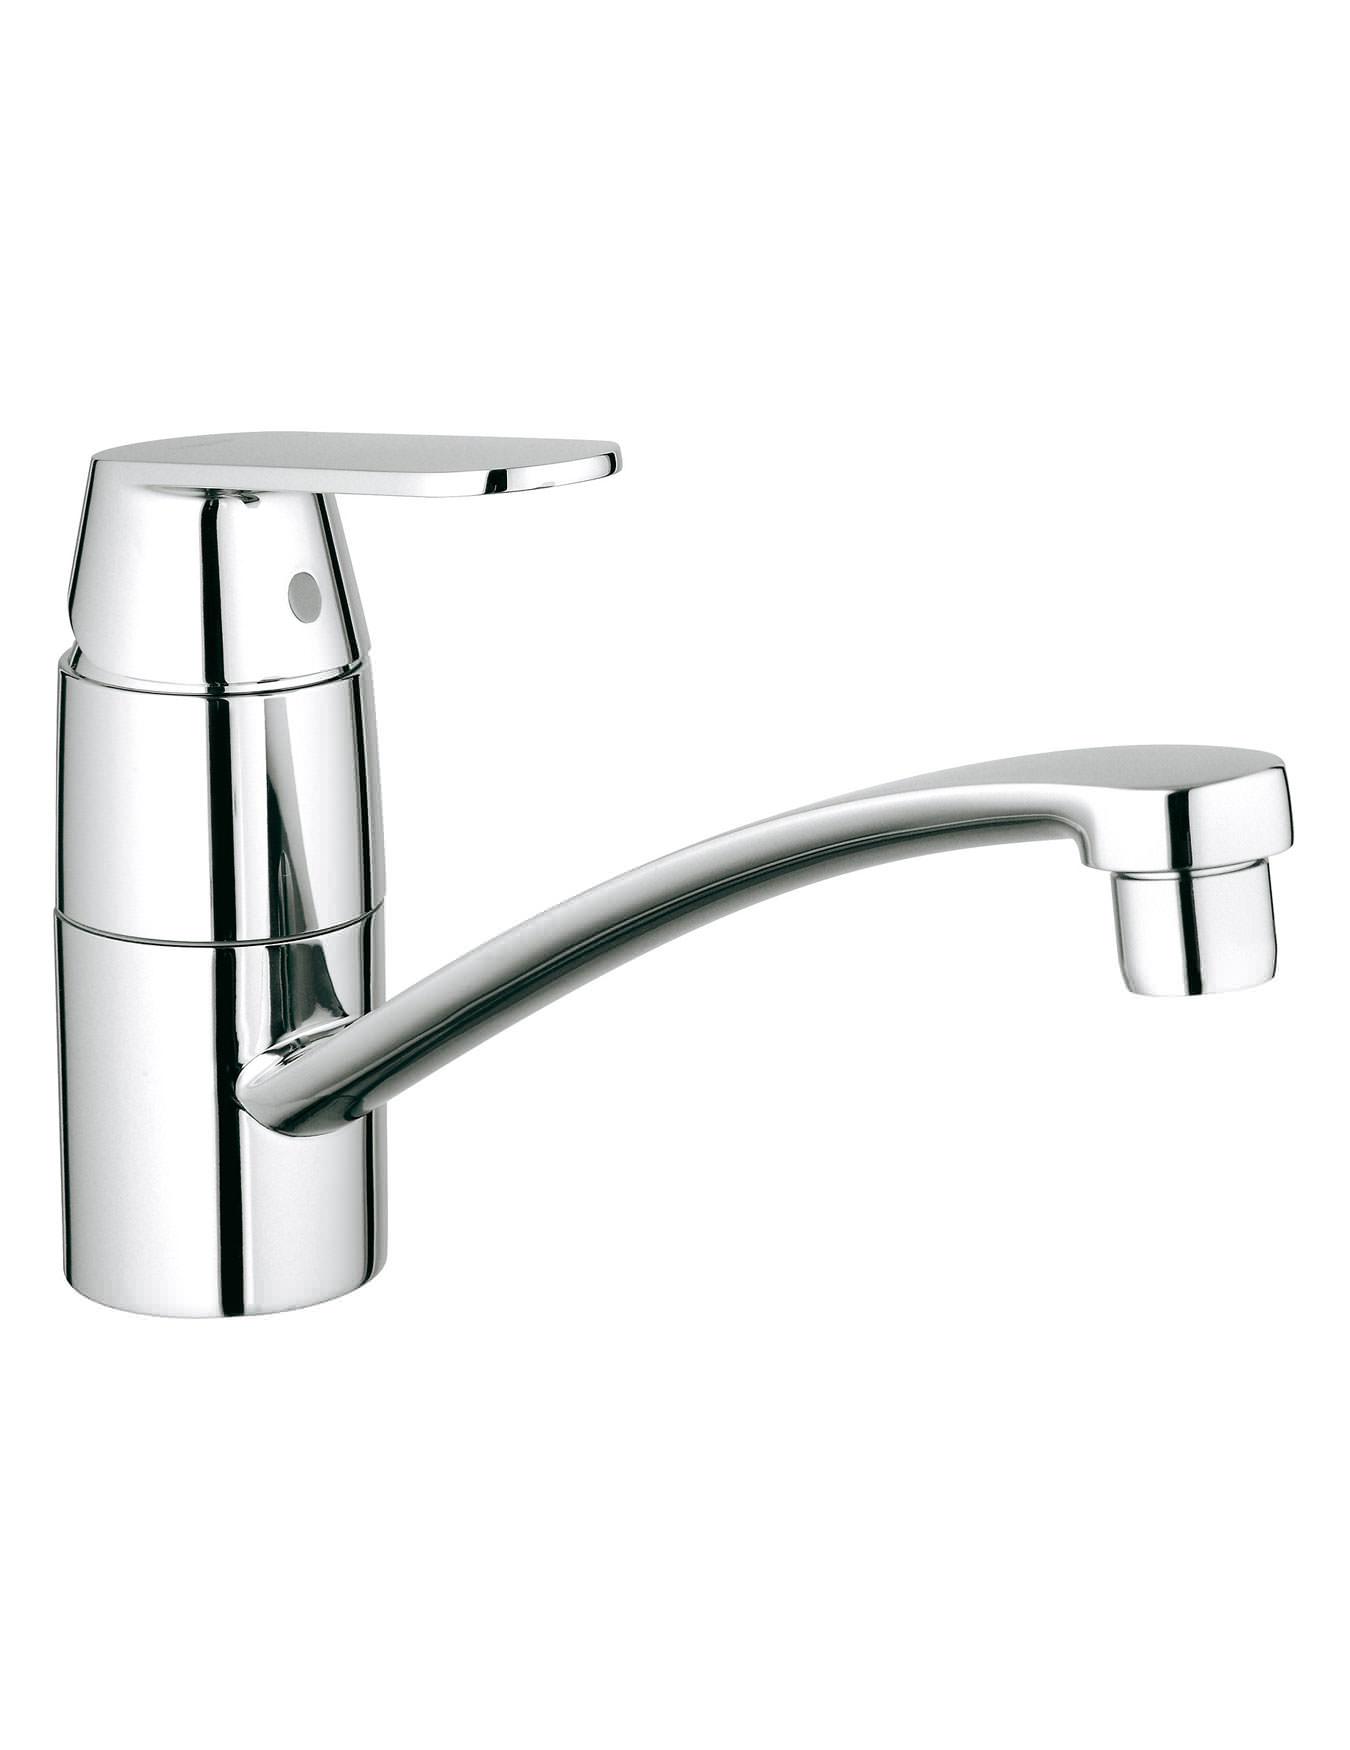 grohe eurosmart cosmopolitan low spout monobloc sink mixer tap. Black Bedroom Furniture Sets. Home Design Ideas